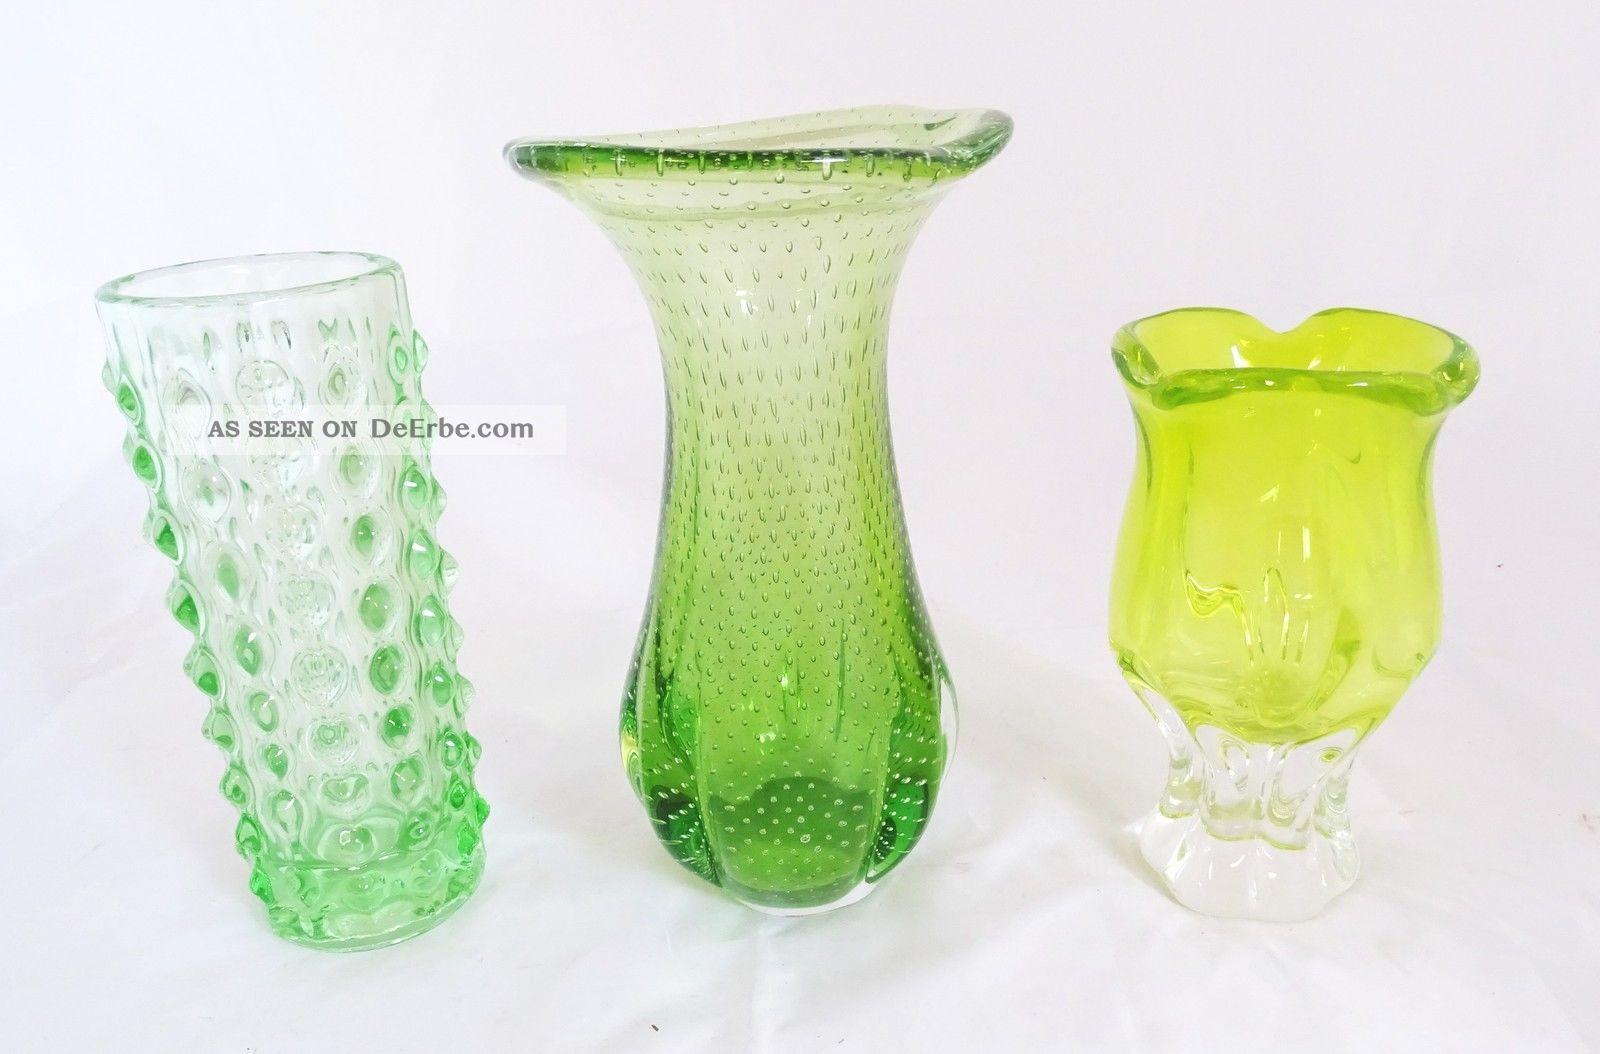 3x Panton Ära 70er Jahre Design Glas Vasen Vase Grün 70s Grüntöne Designerglas 1970-1979 Bild